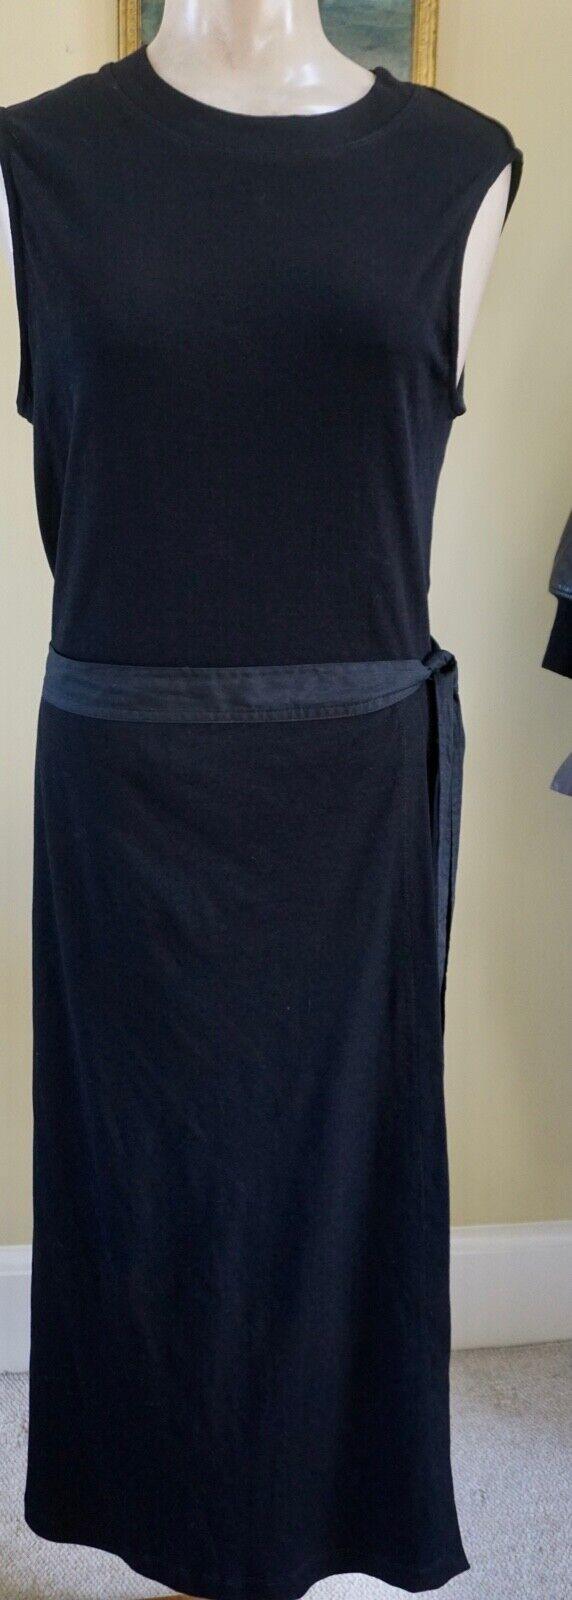 pinktta Getty..USA...a Getty..USA...a Getty..USA...a Jersey Wrap Dress...SZ L  b70532